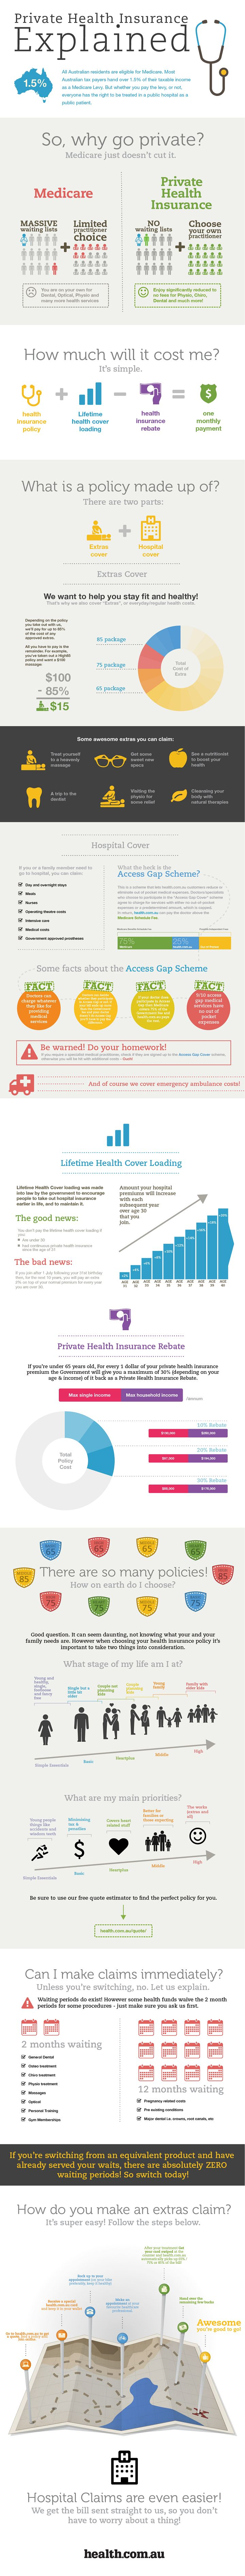 Medicare versus Private Health Insurance